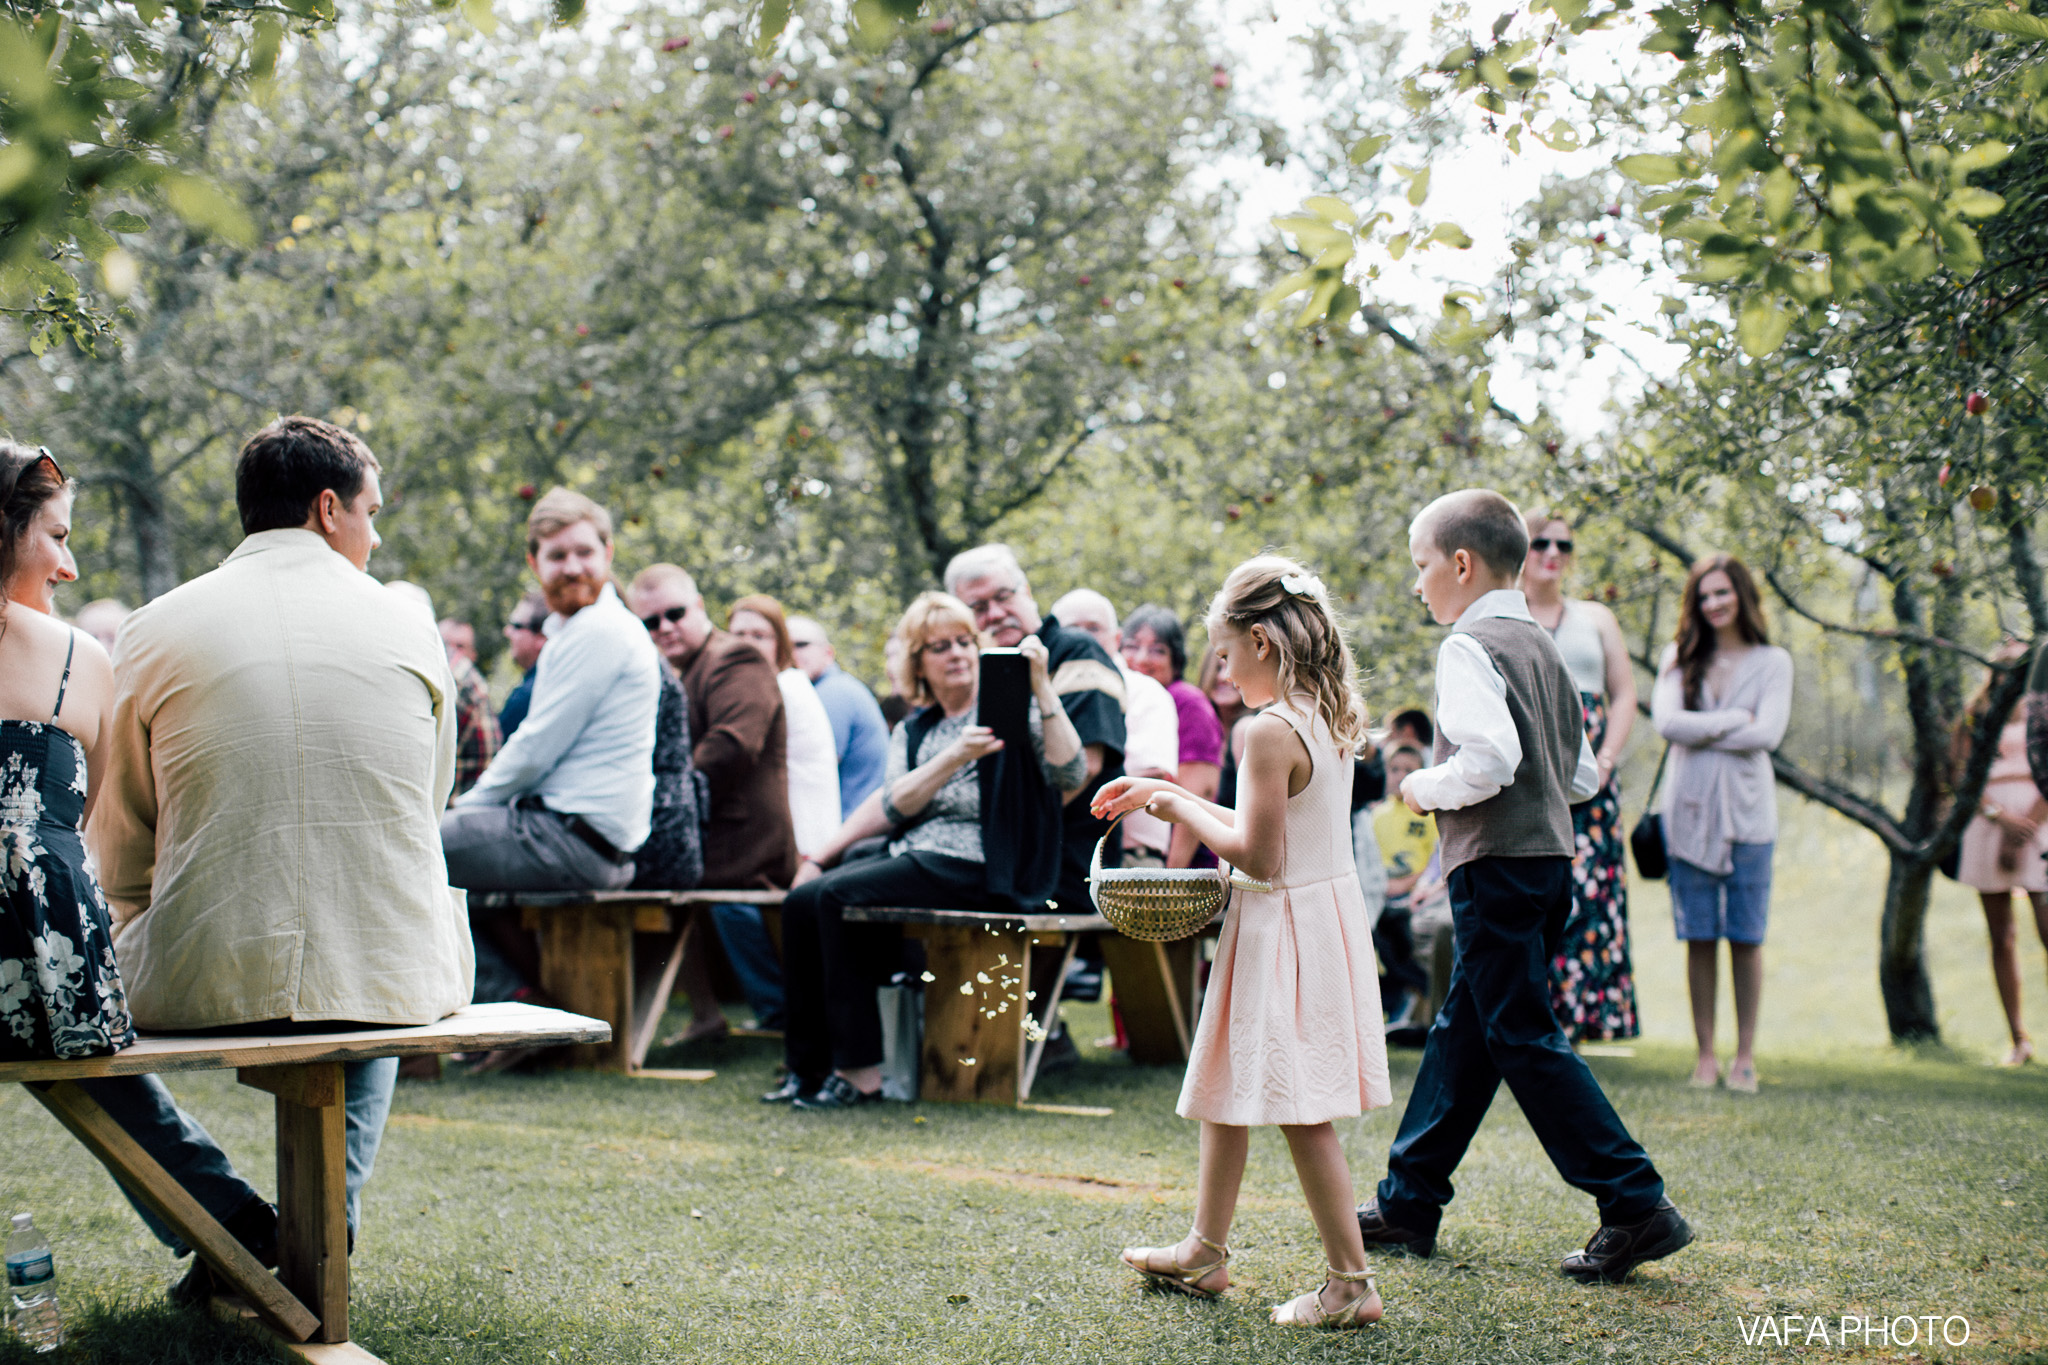 Belsolda-Farm-Wedding-Christy-Eric-Vafa-Photo-398.jpg